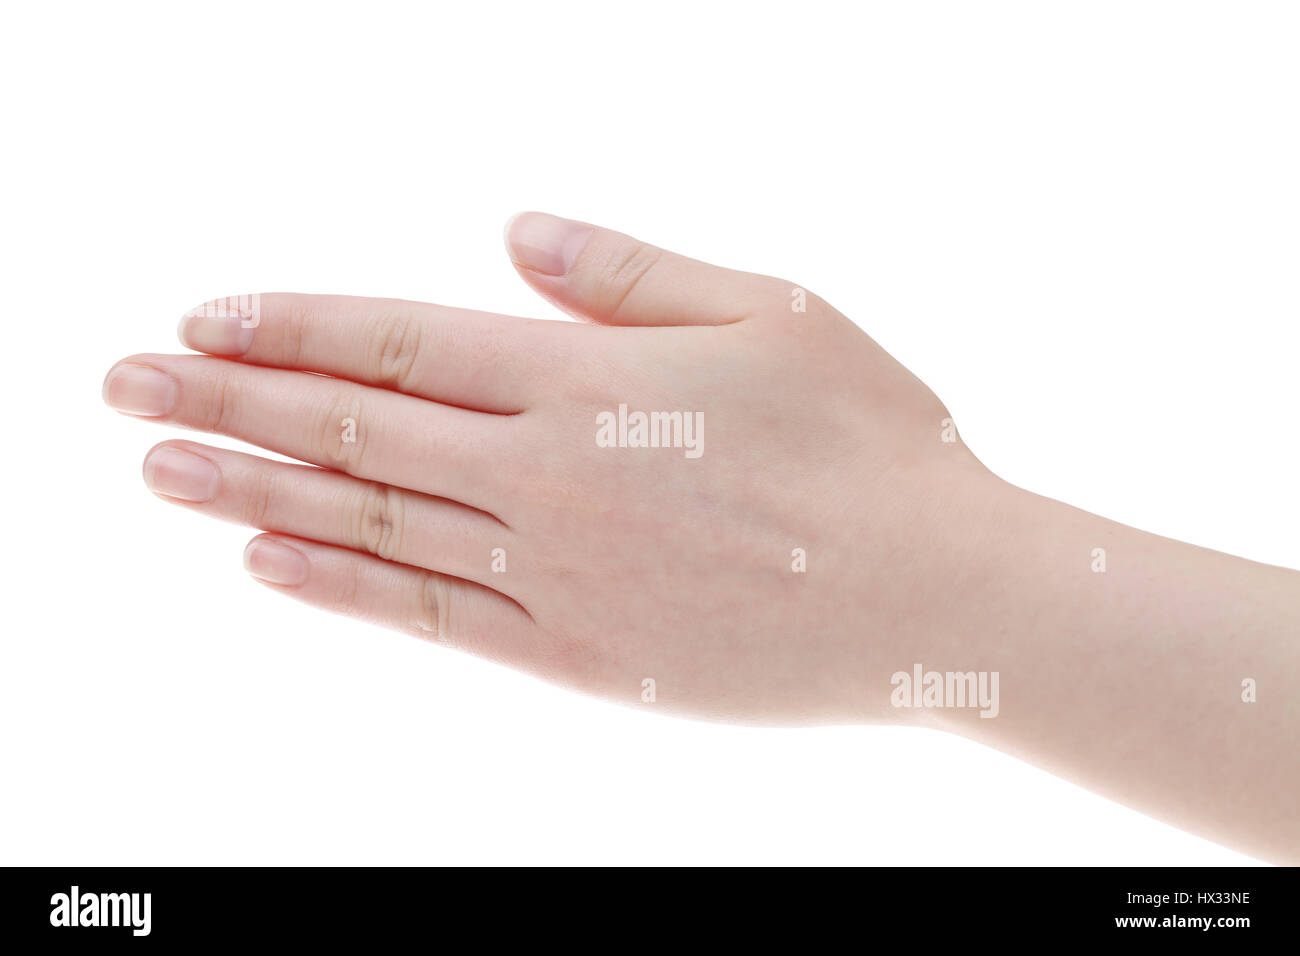 Female Hand Wrist Anatomy Back Stock Photos & Female Hand Wrist ...